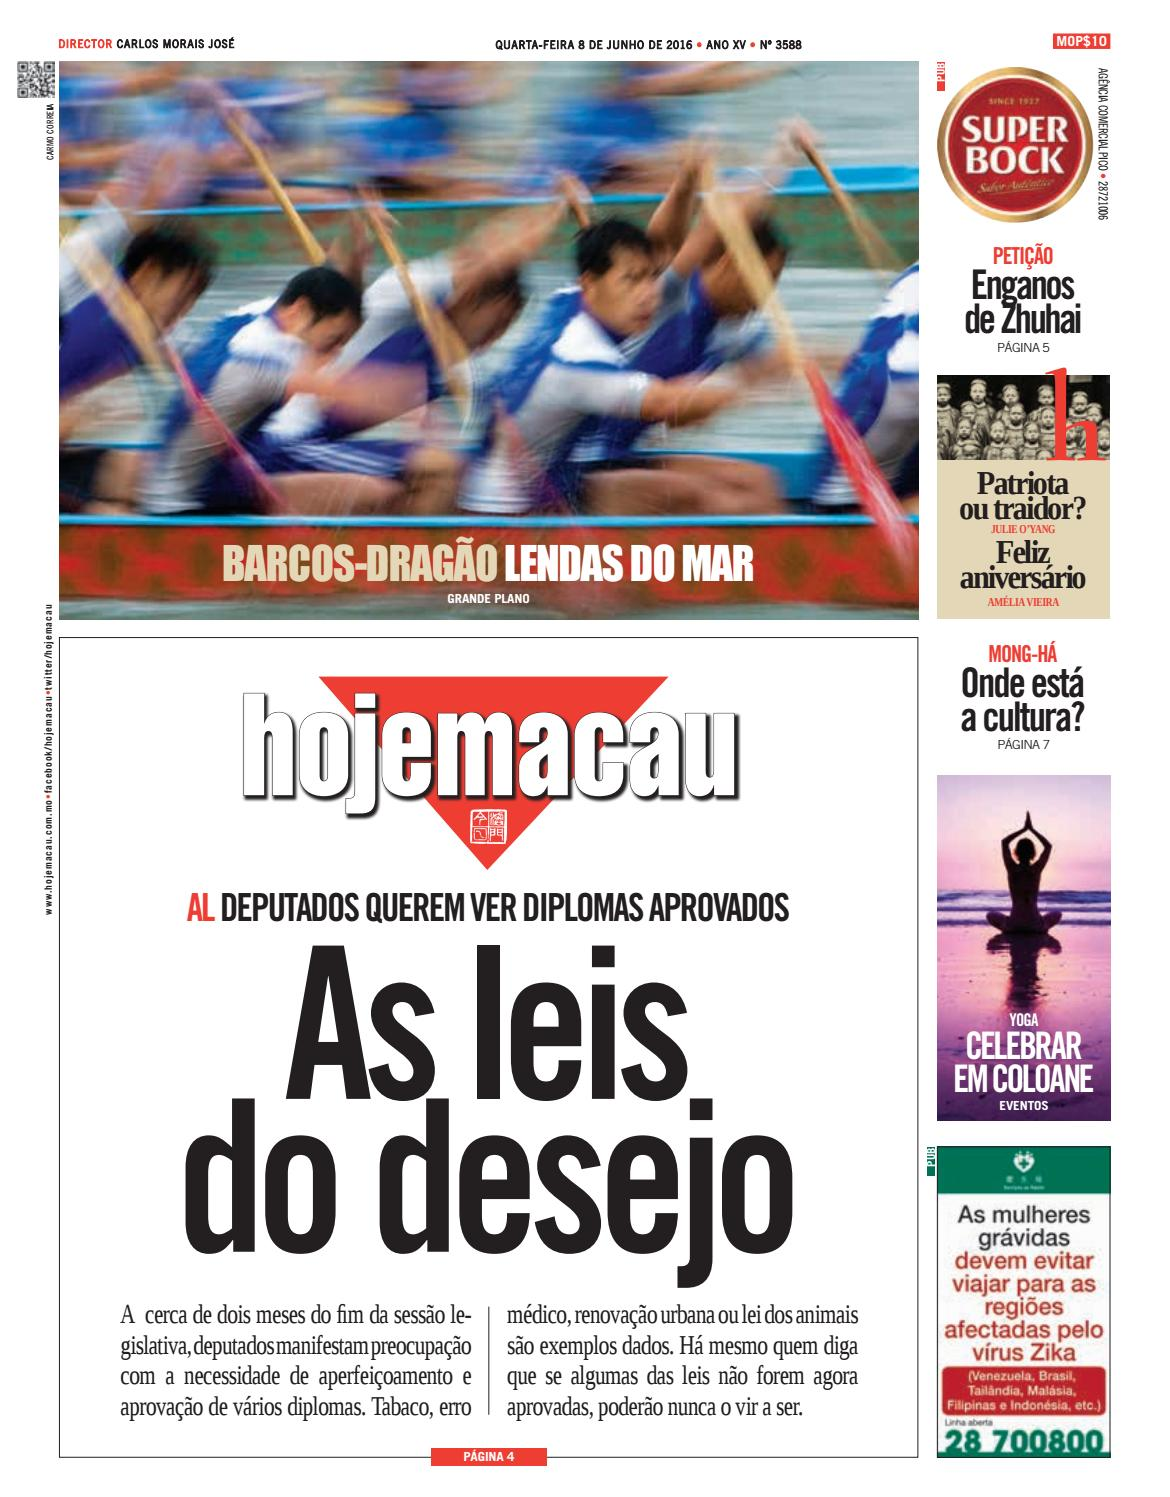 dc56f450c3 Hoje Macau 8 JUN 2016 #3588 by Jornal Hoje Macau - issuu